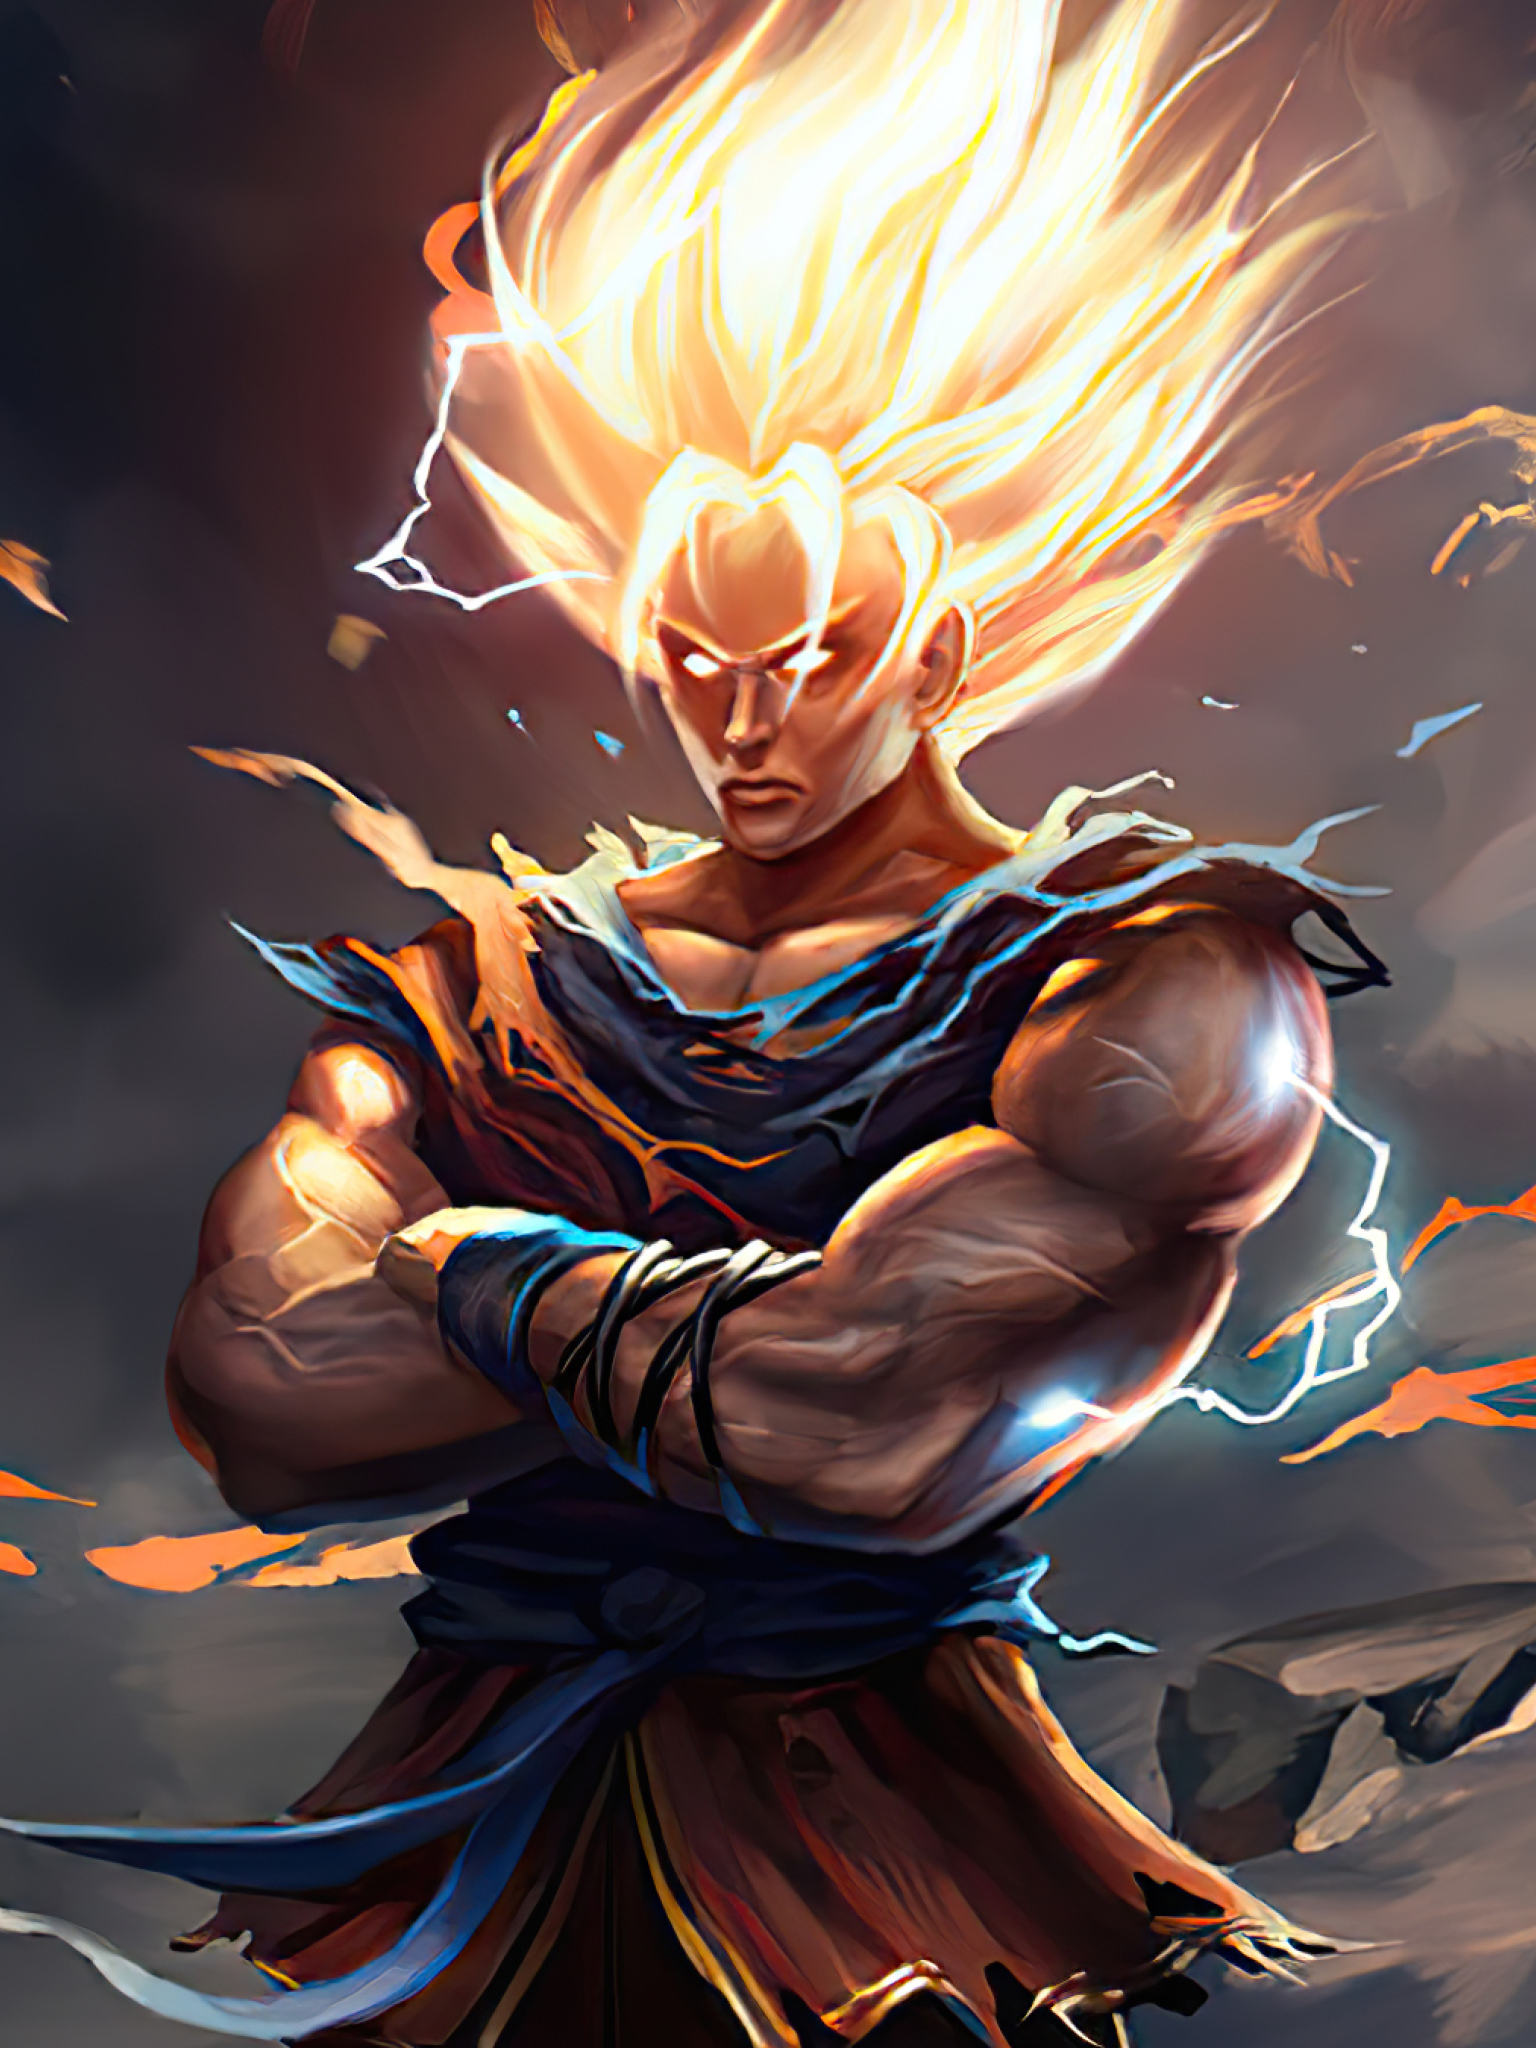 1536x2048 Goku New Dragon Ball Z Art 1536x2048 Resolution ...